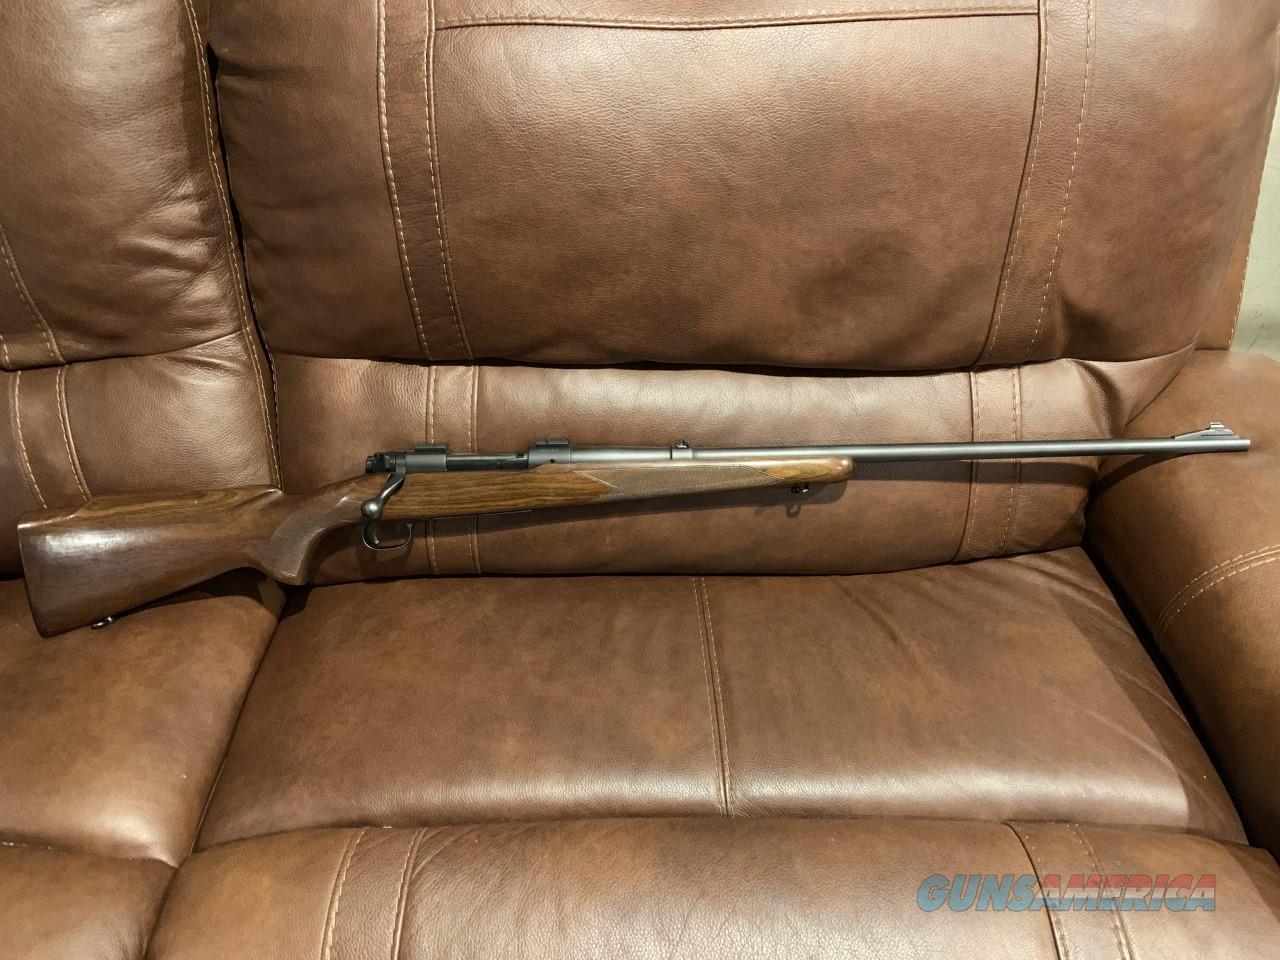 Winchester Pre-64 Model 70 220 Swift Minty  Guns > Rifles > Winchester Rifles - Modern Bolt/Auto/Single > Model 70 > Pre-64